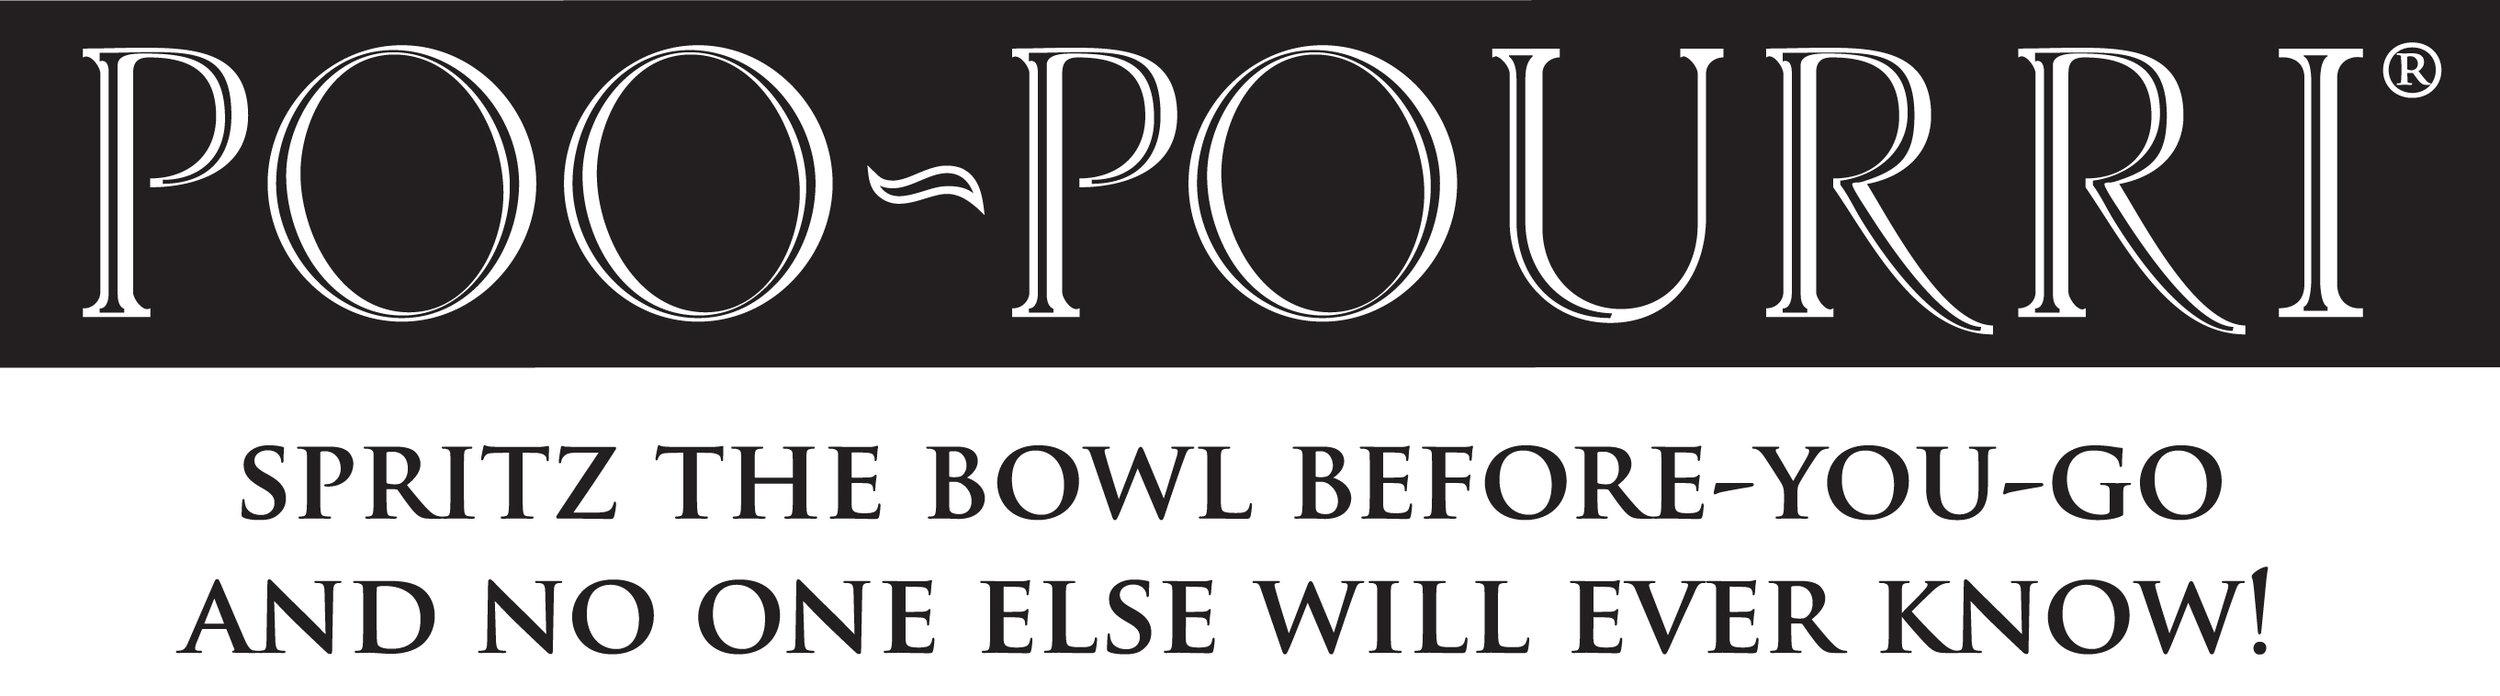 poopourri logo.jpg